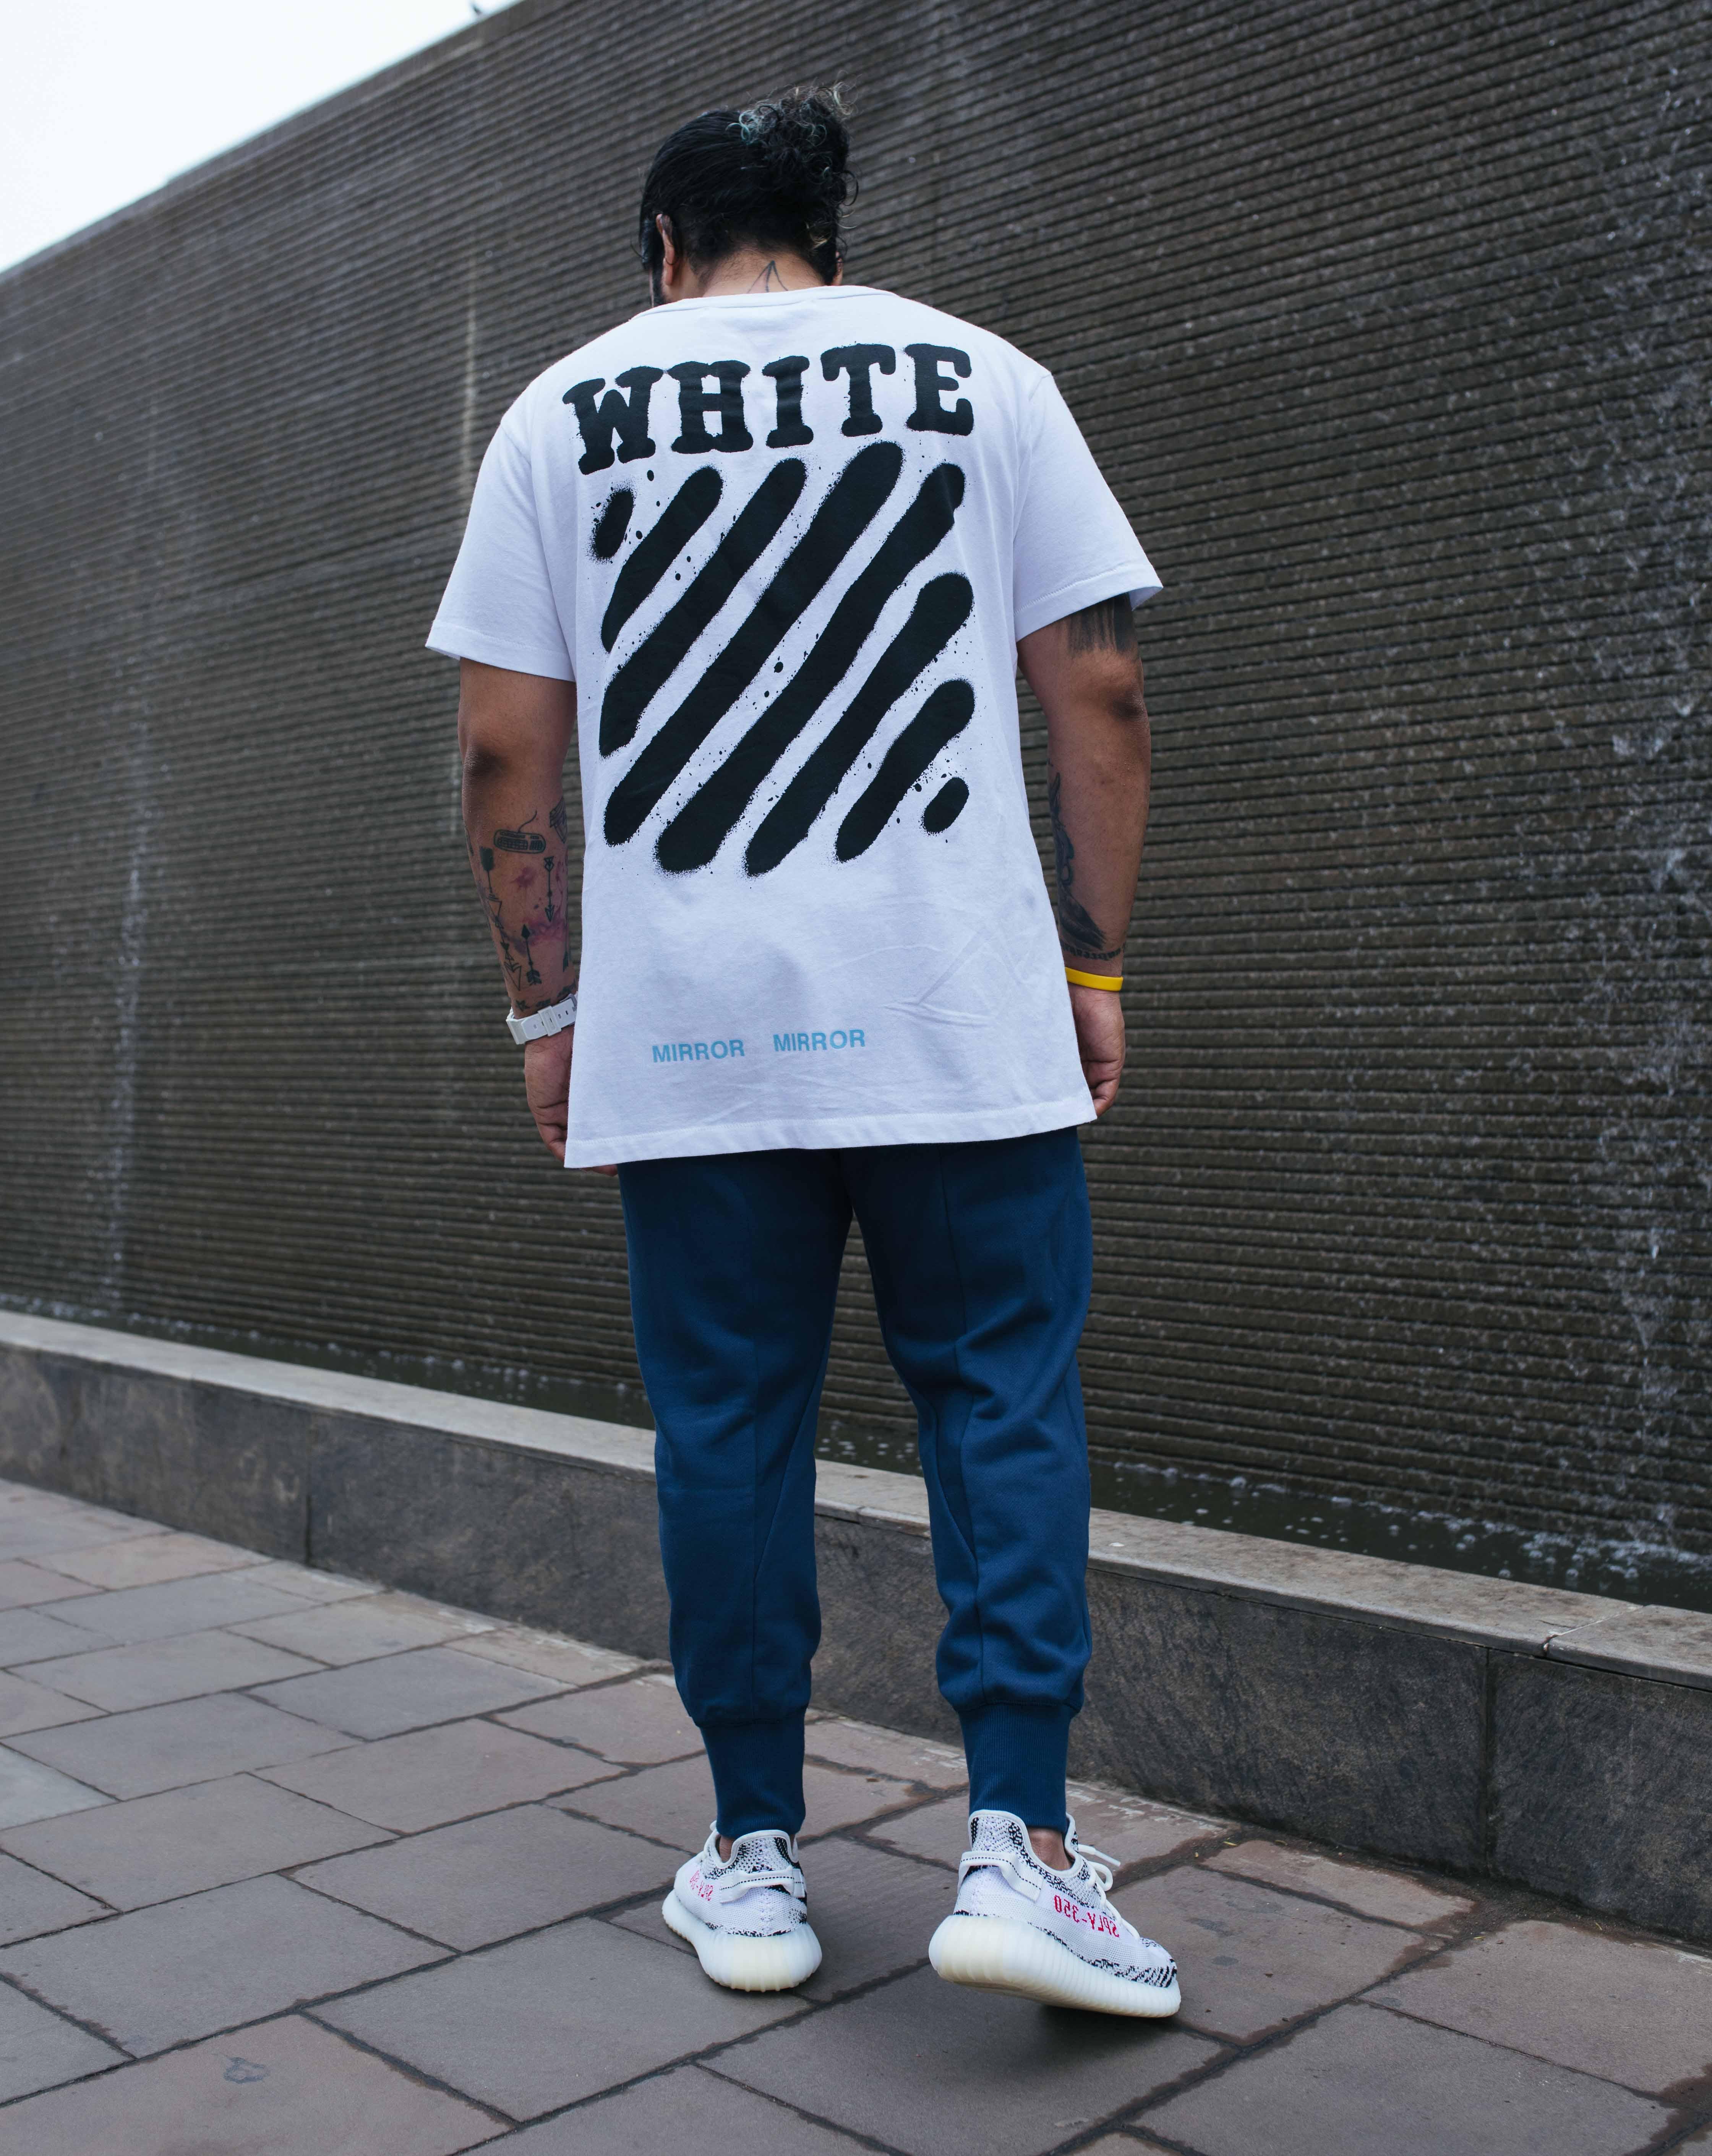 OFF-WHITE Tee, XBYO Joggers, G Shock